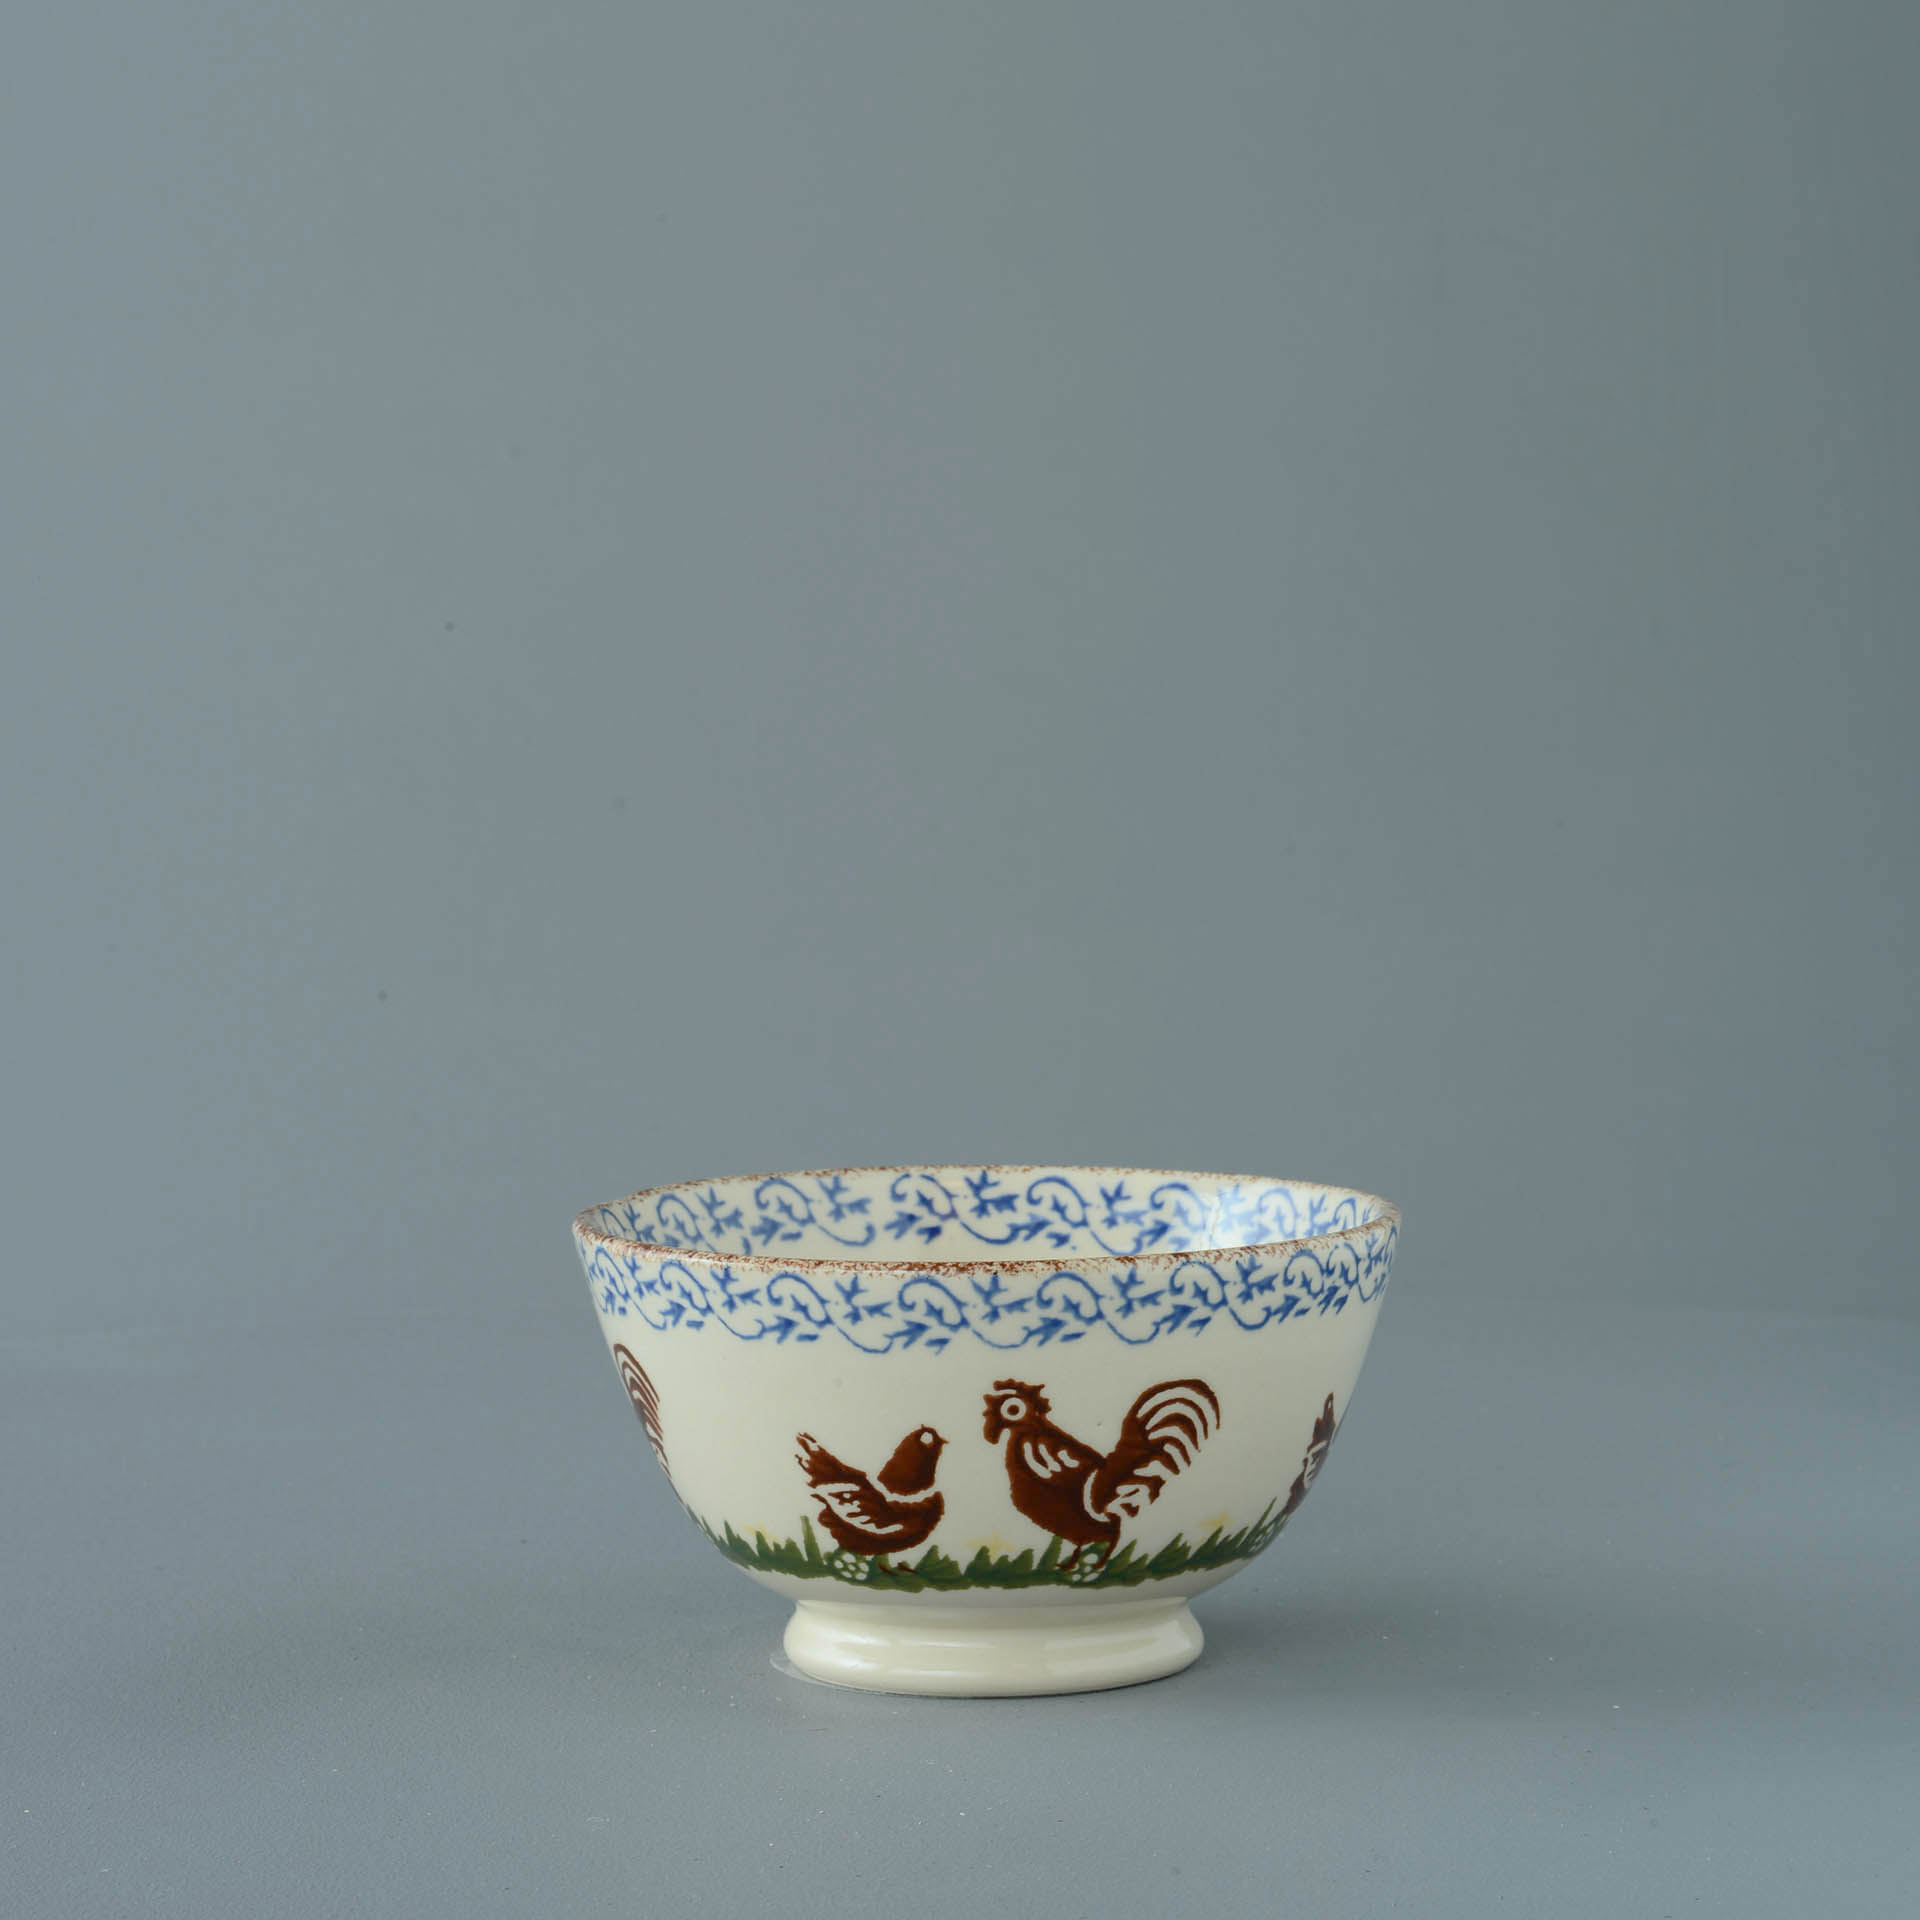 Cock & Hen Small Bowl 6.5 x 12 cm